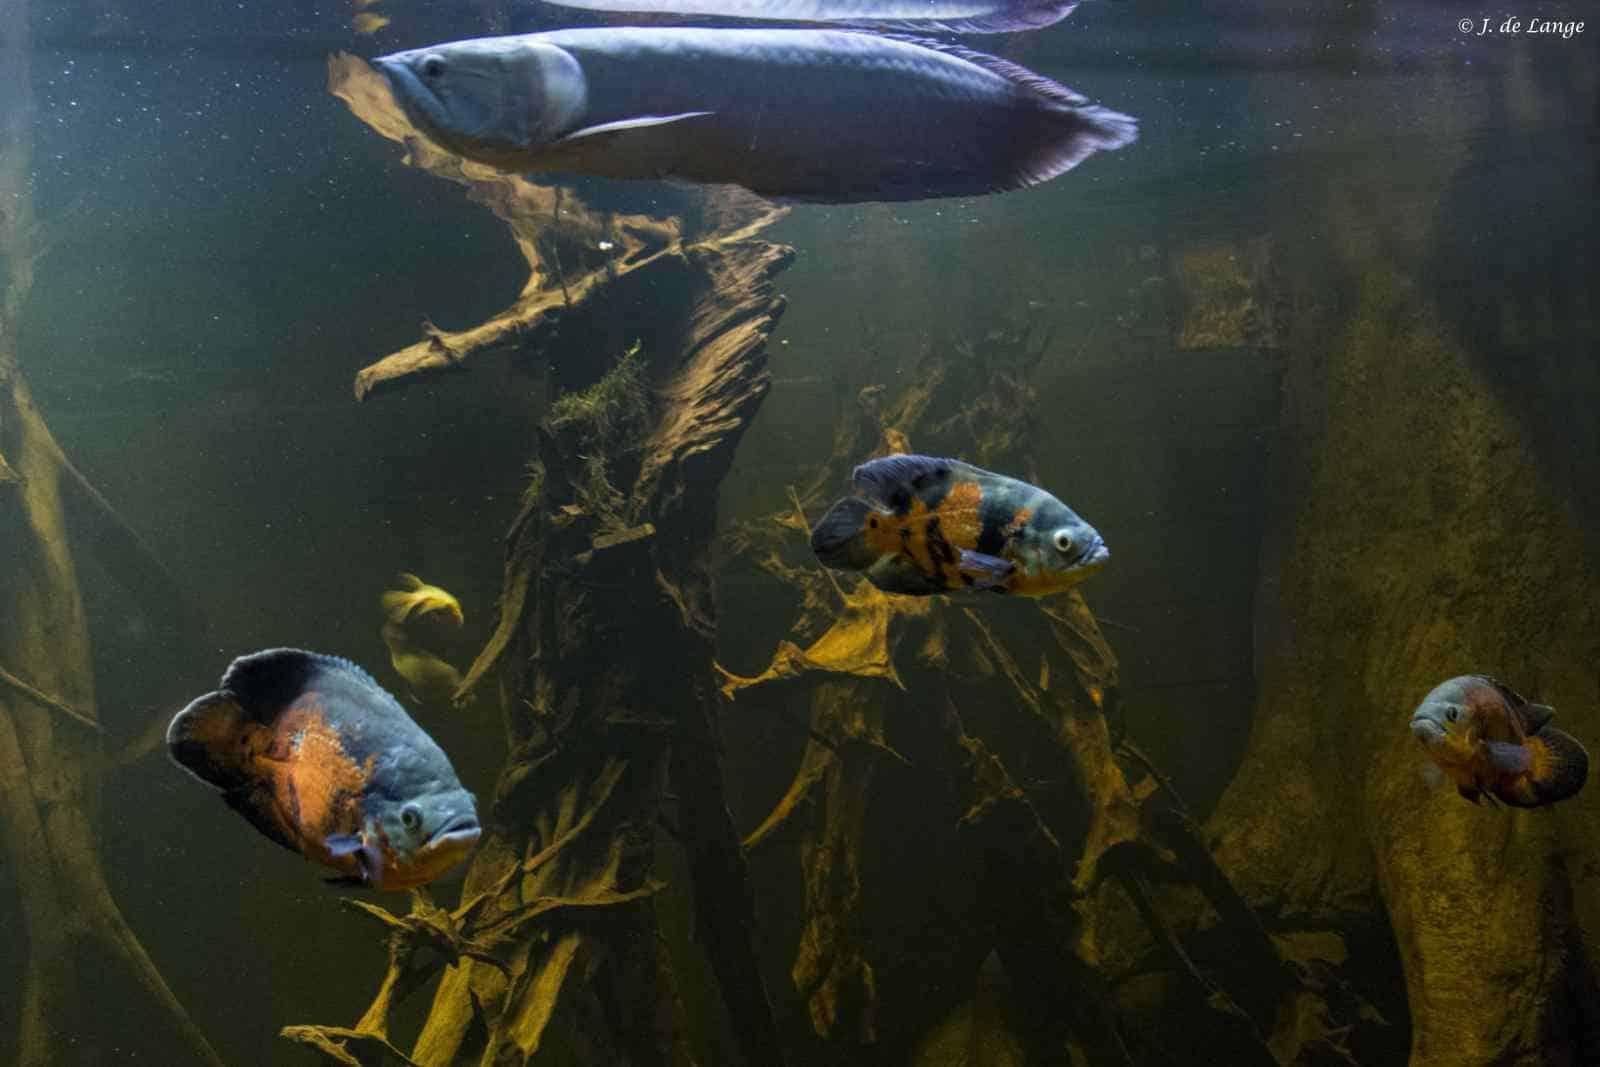 Hout in het aquarium